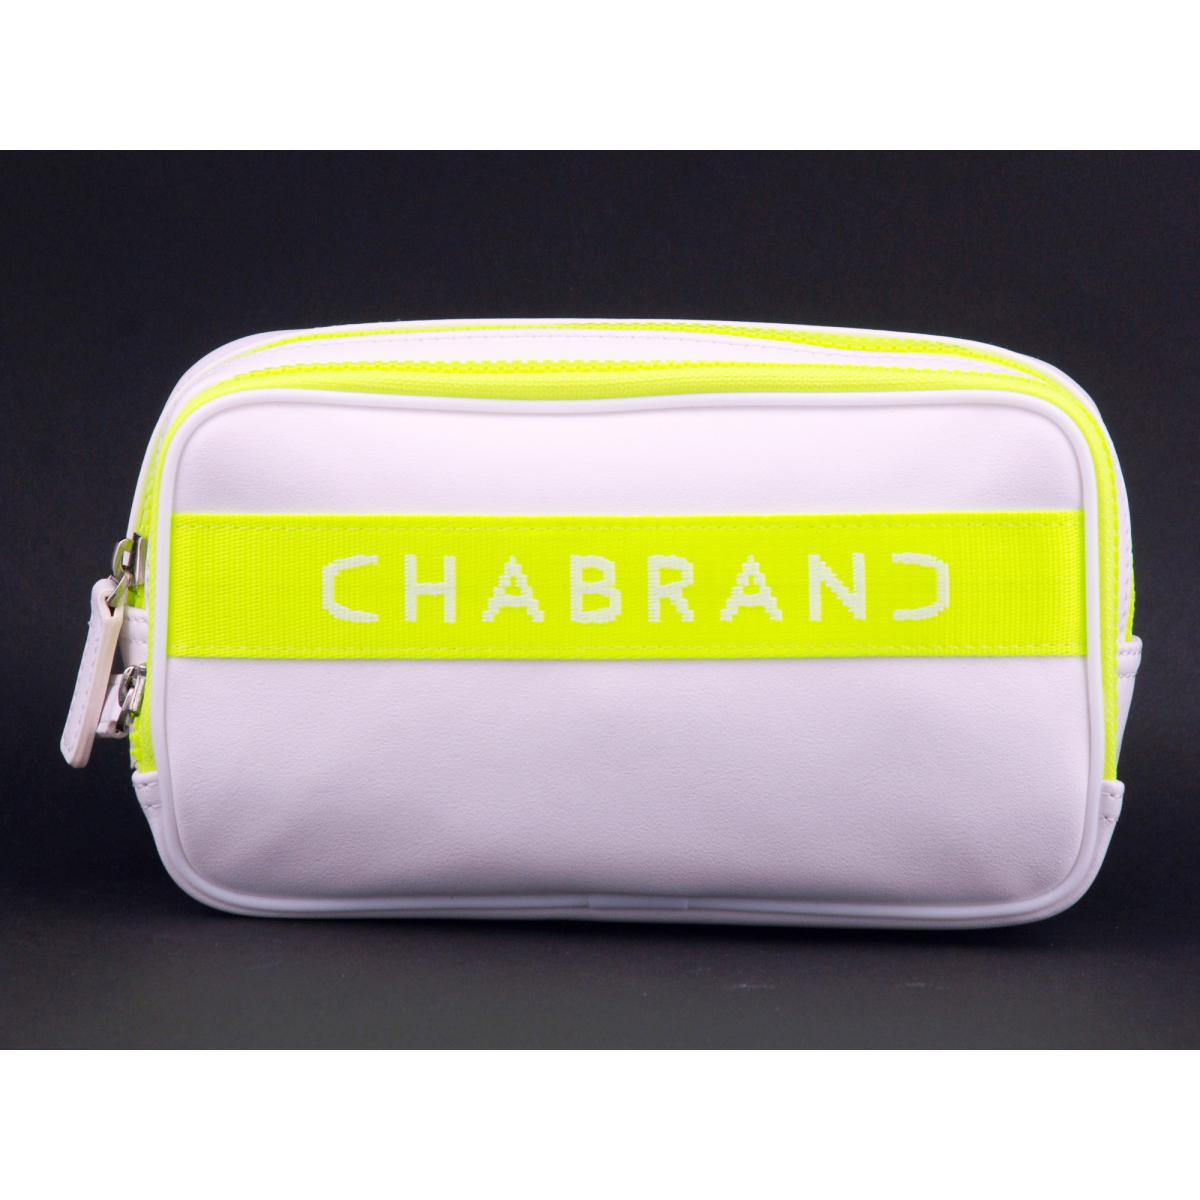 Sac banane \'Chabrand\' blanc fluo - 22x13x6 cm (2 compartiments) - [Z0044]